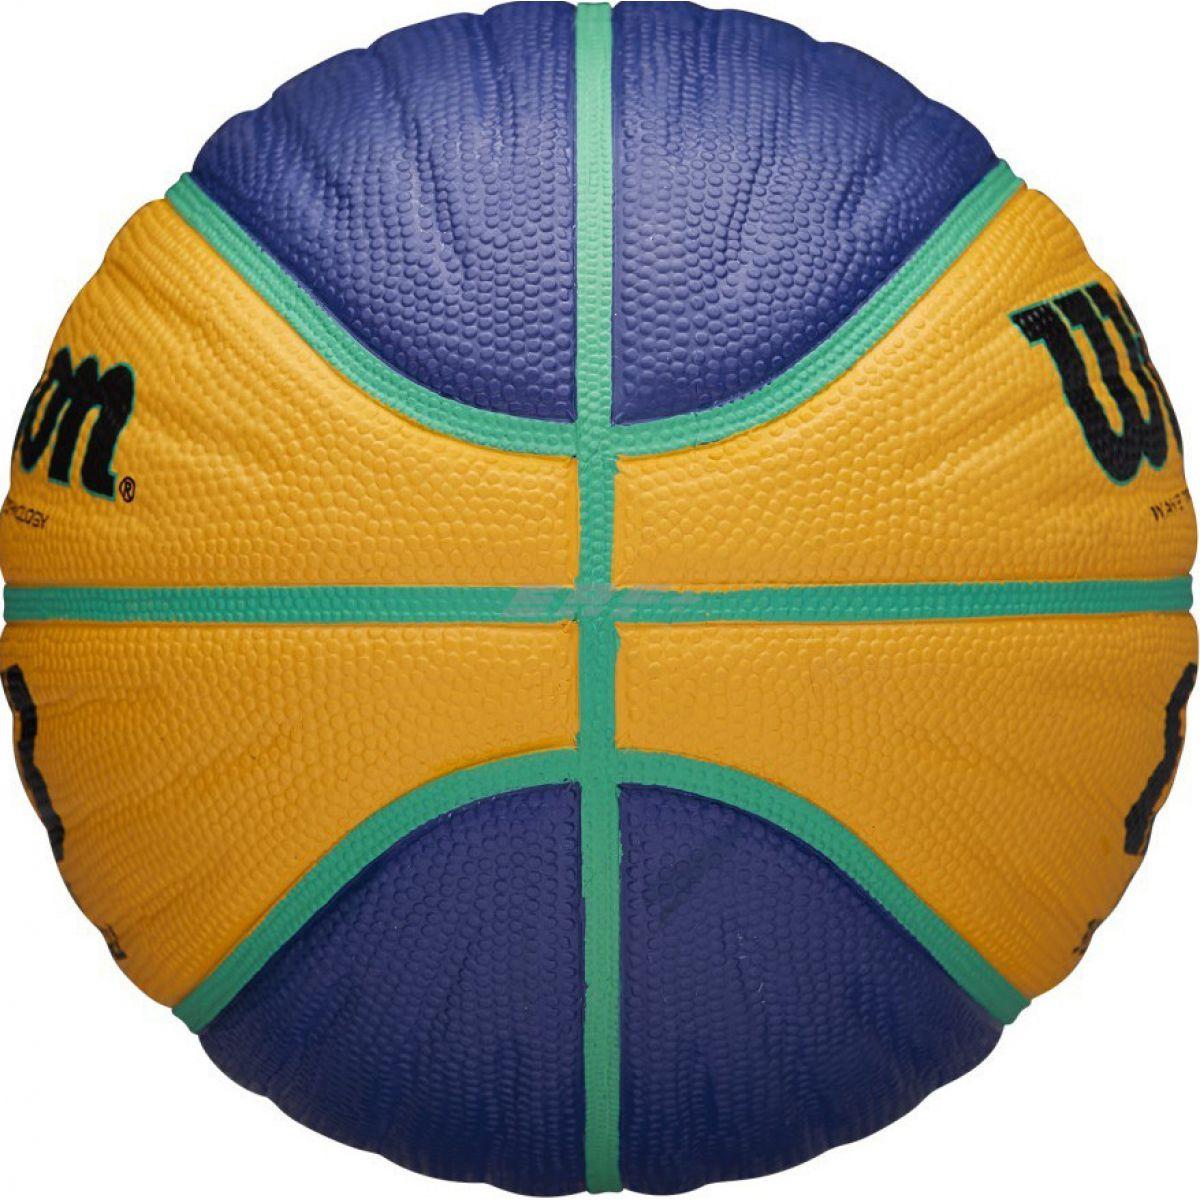 Мяч баск. WILSON FIBA3x3 Replica, арт.WTB1133XB, р.5, резина, бутил. камера, сине-желтый